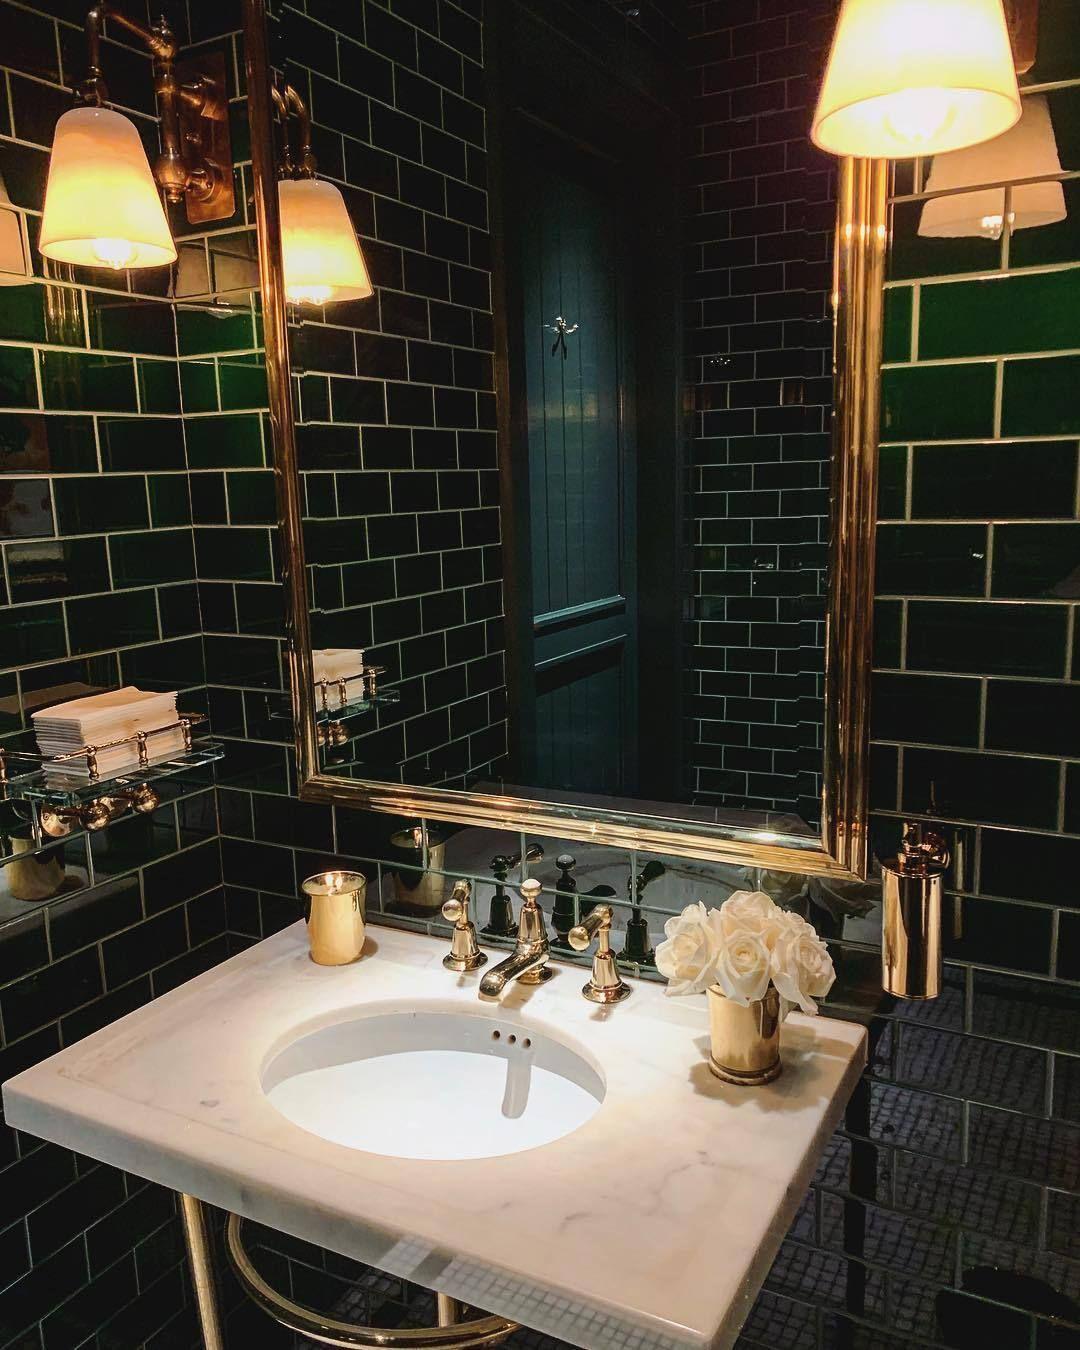 Tkkatherineblog Ralph S Coffee Bar At Polo Ralph Lauren Inst Juliearoenning Bathroom Interior Green Bathroom Toilet Design